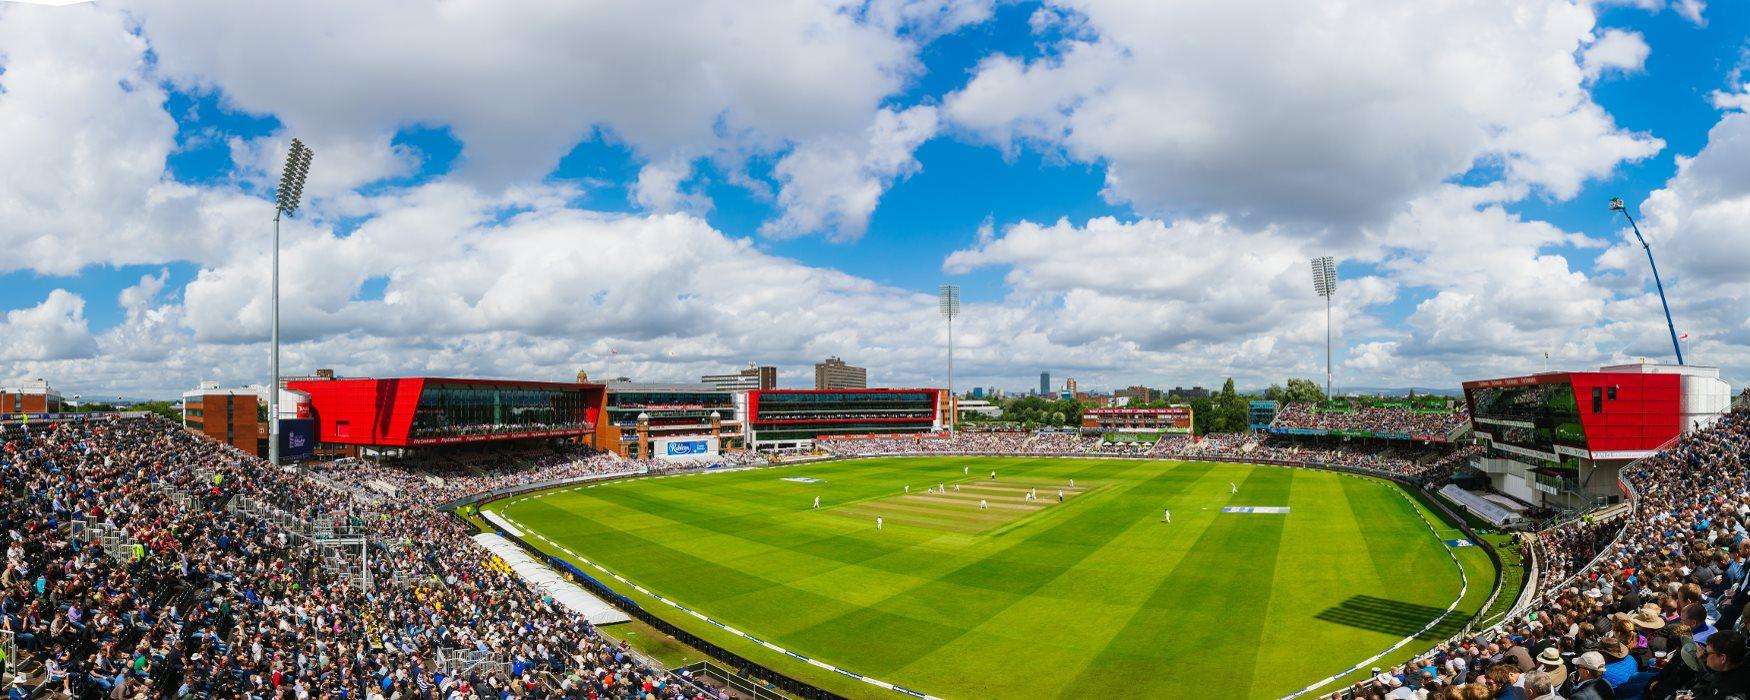 THE 10 BEST Manchester Sights & Landmarks - TripAdvisor